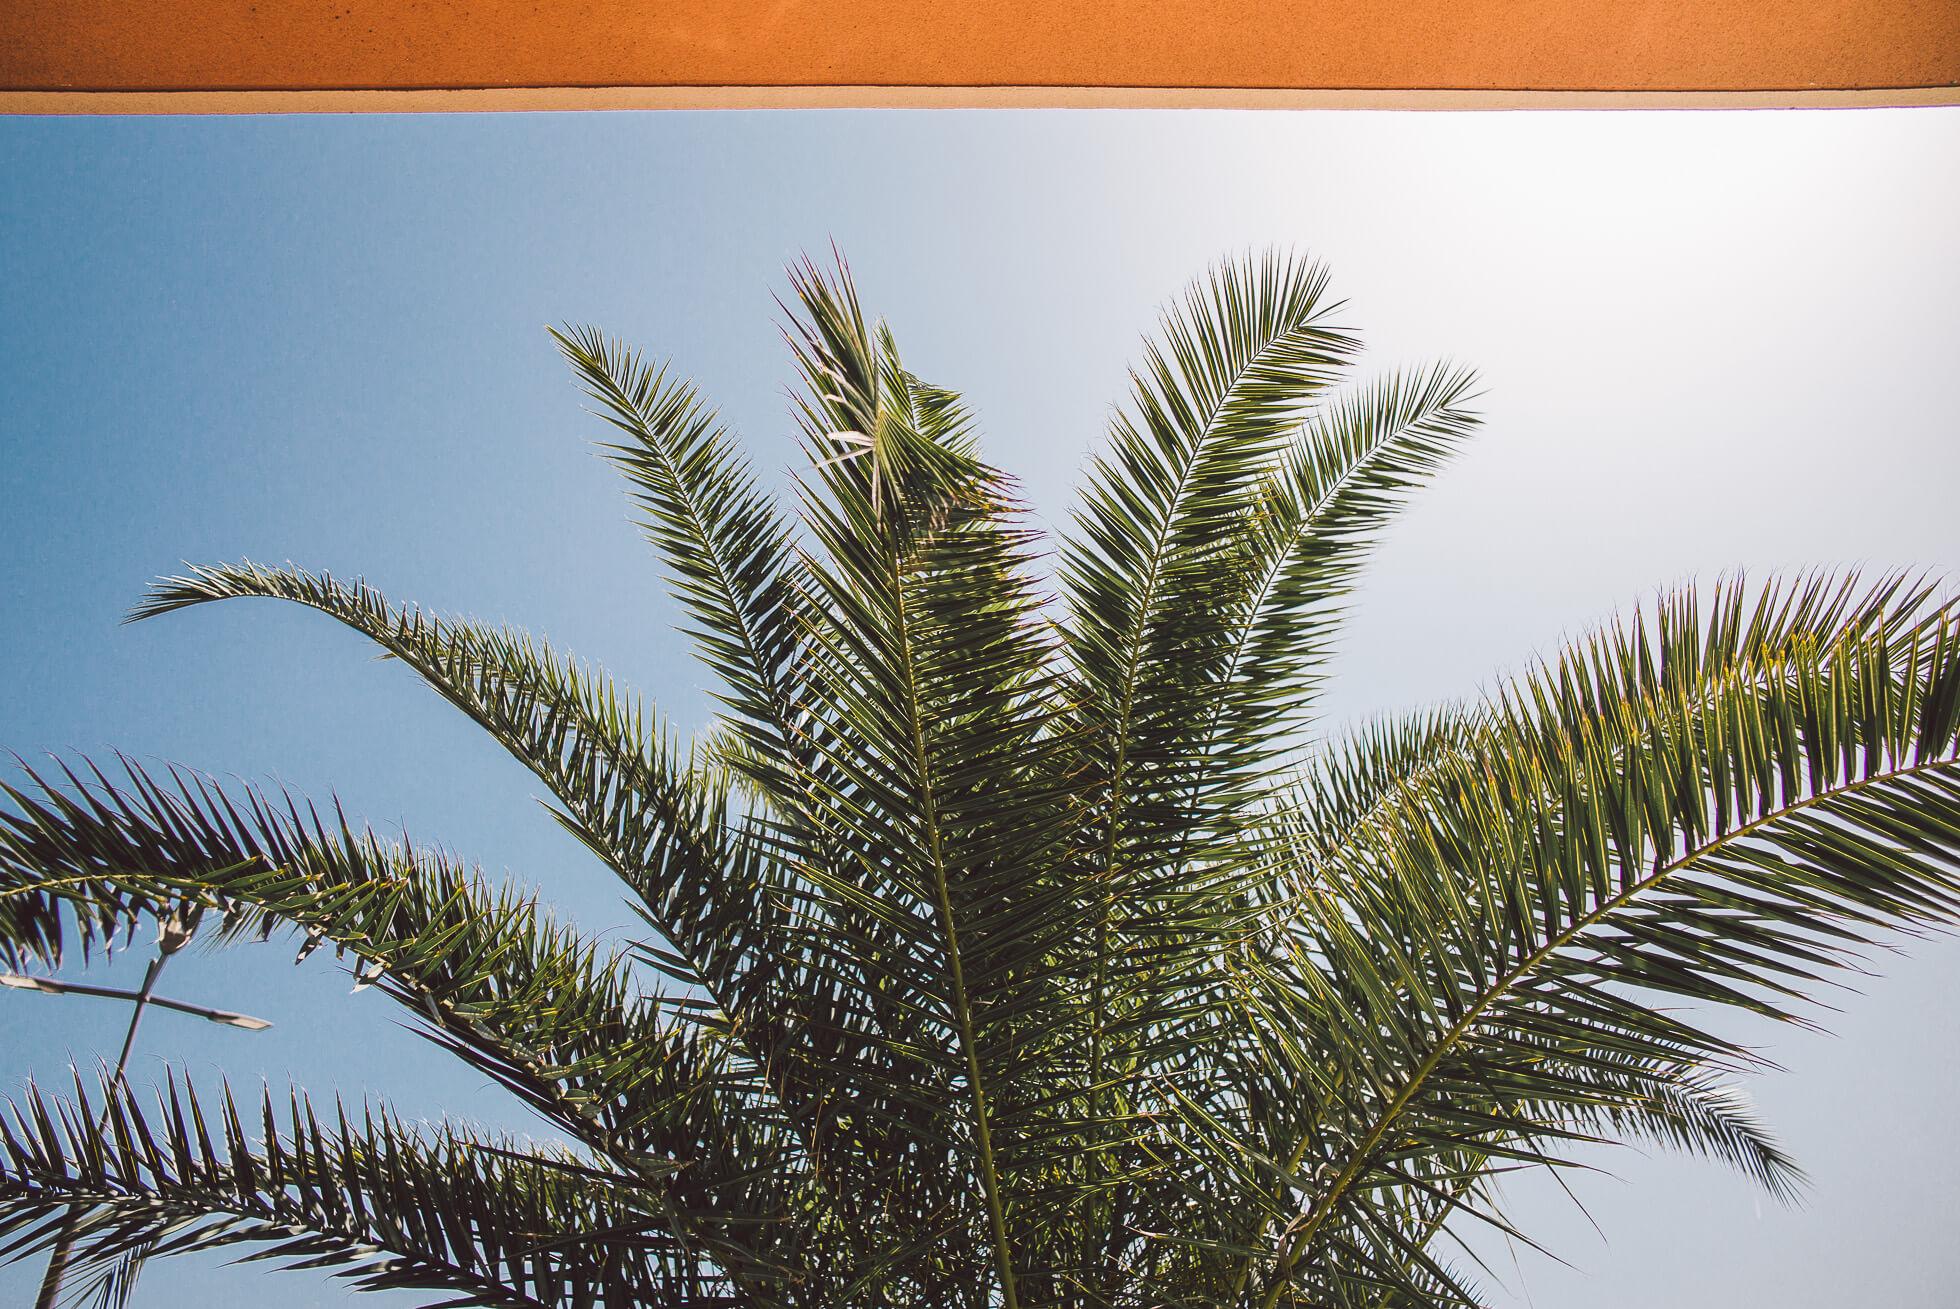 janni-deler-sunday-plansL1000935